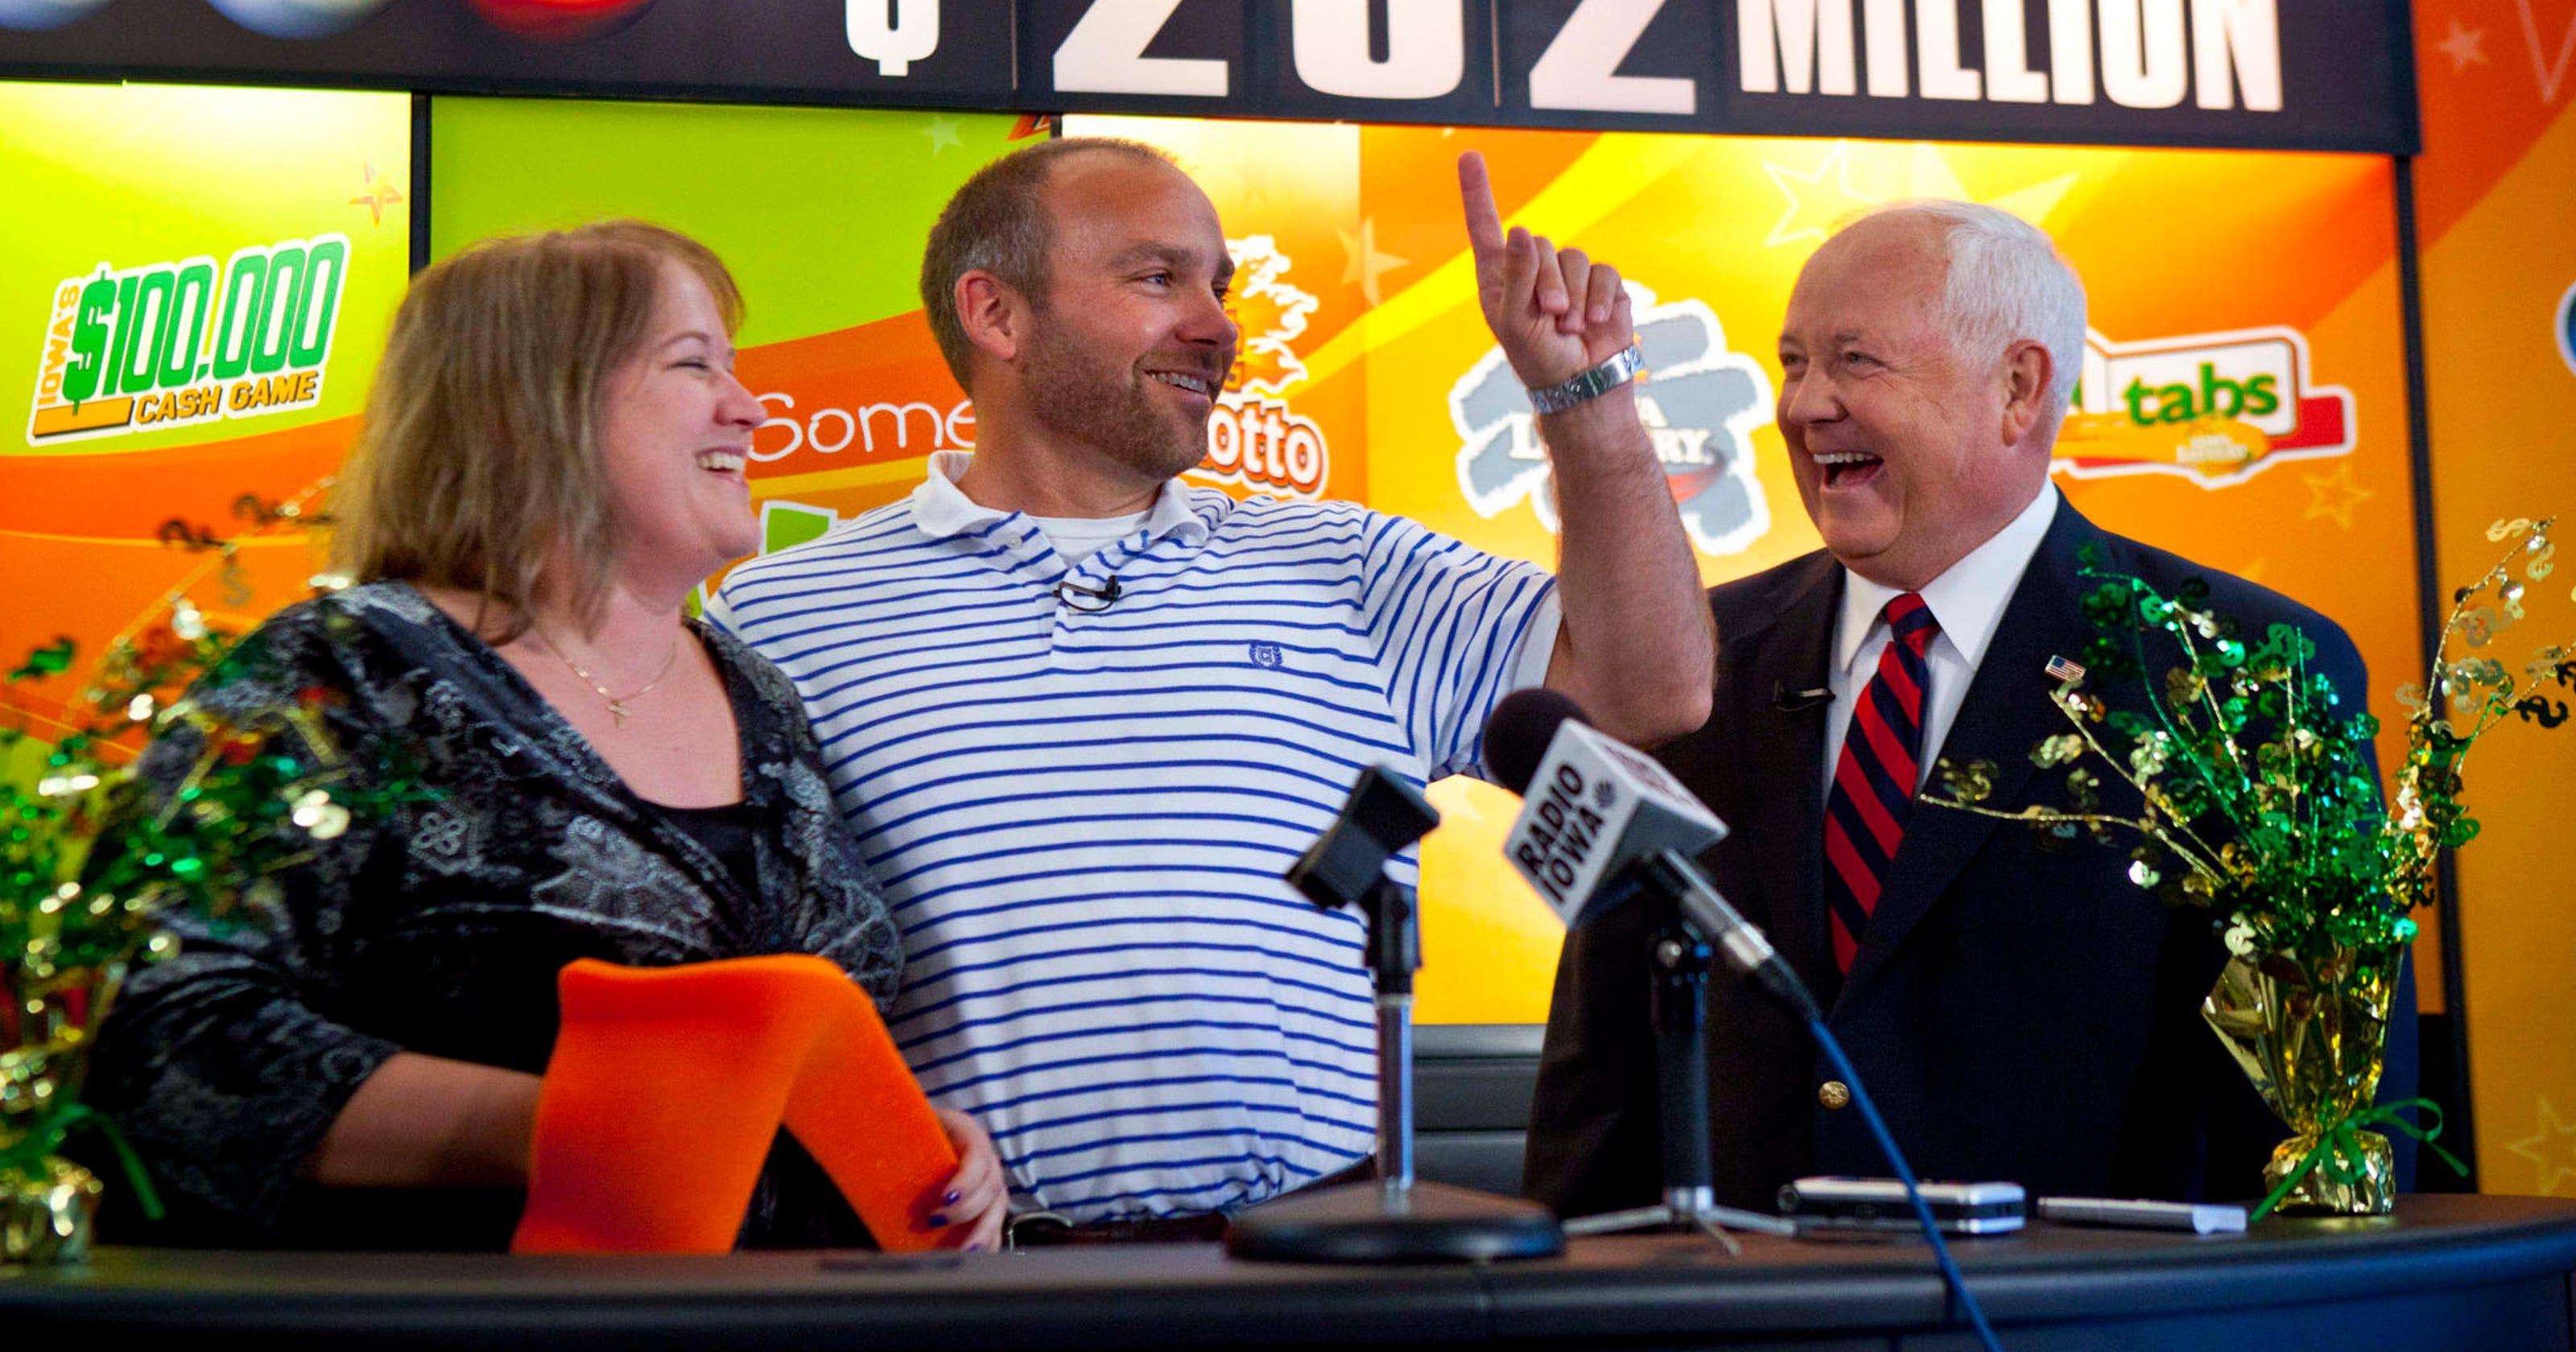 Iowa lottery jackpot winner gives advice to Redfield